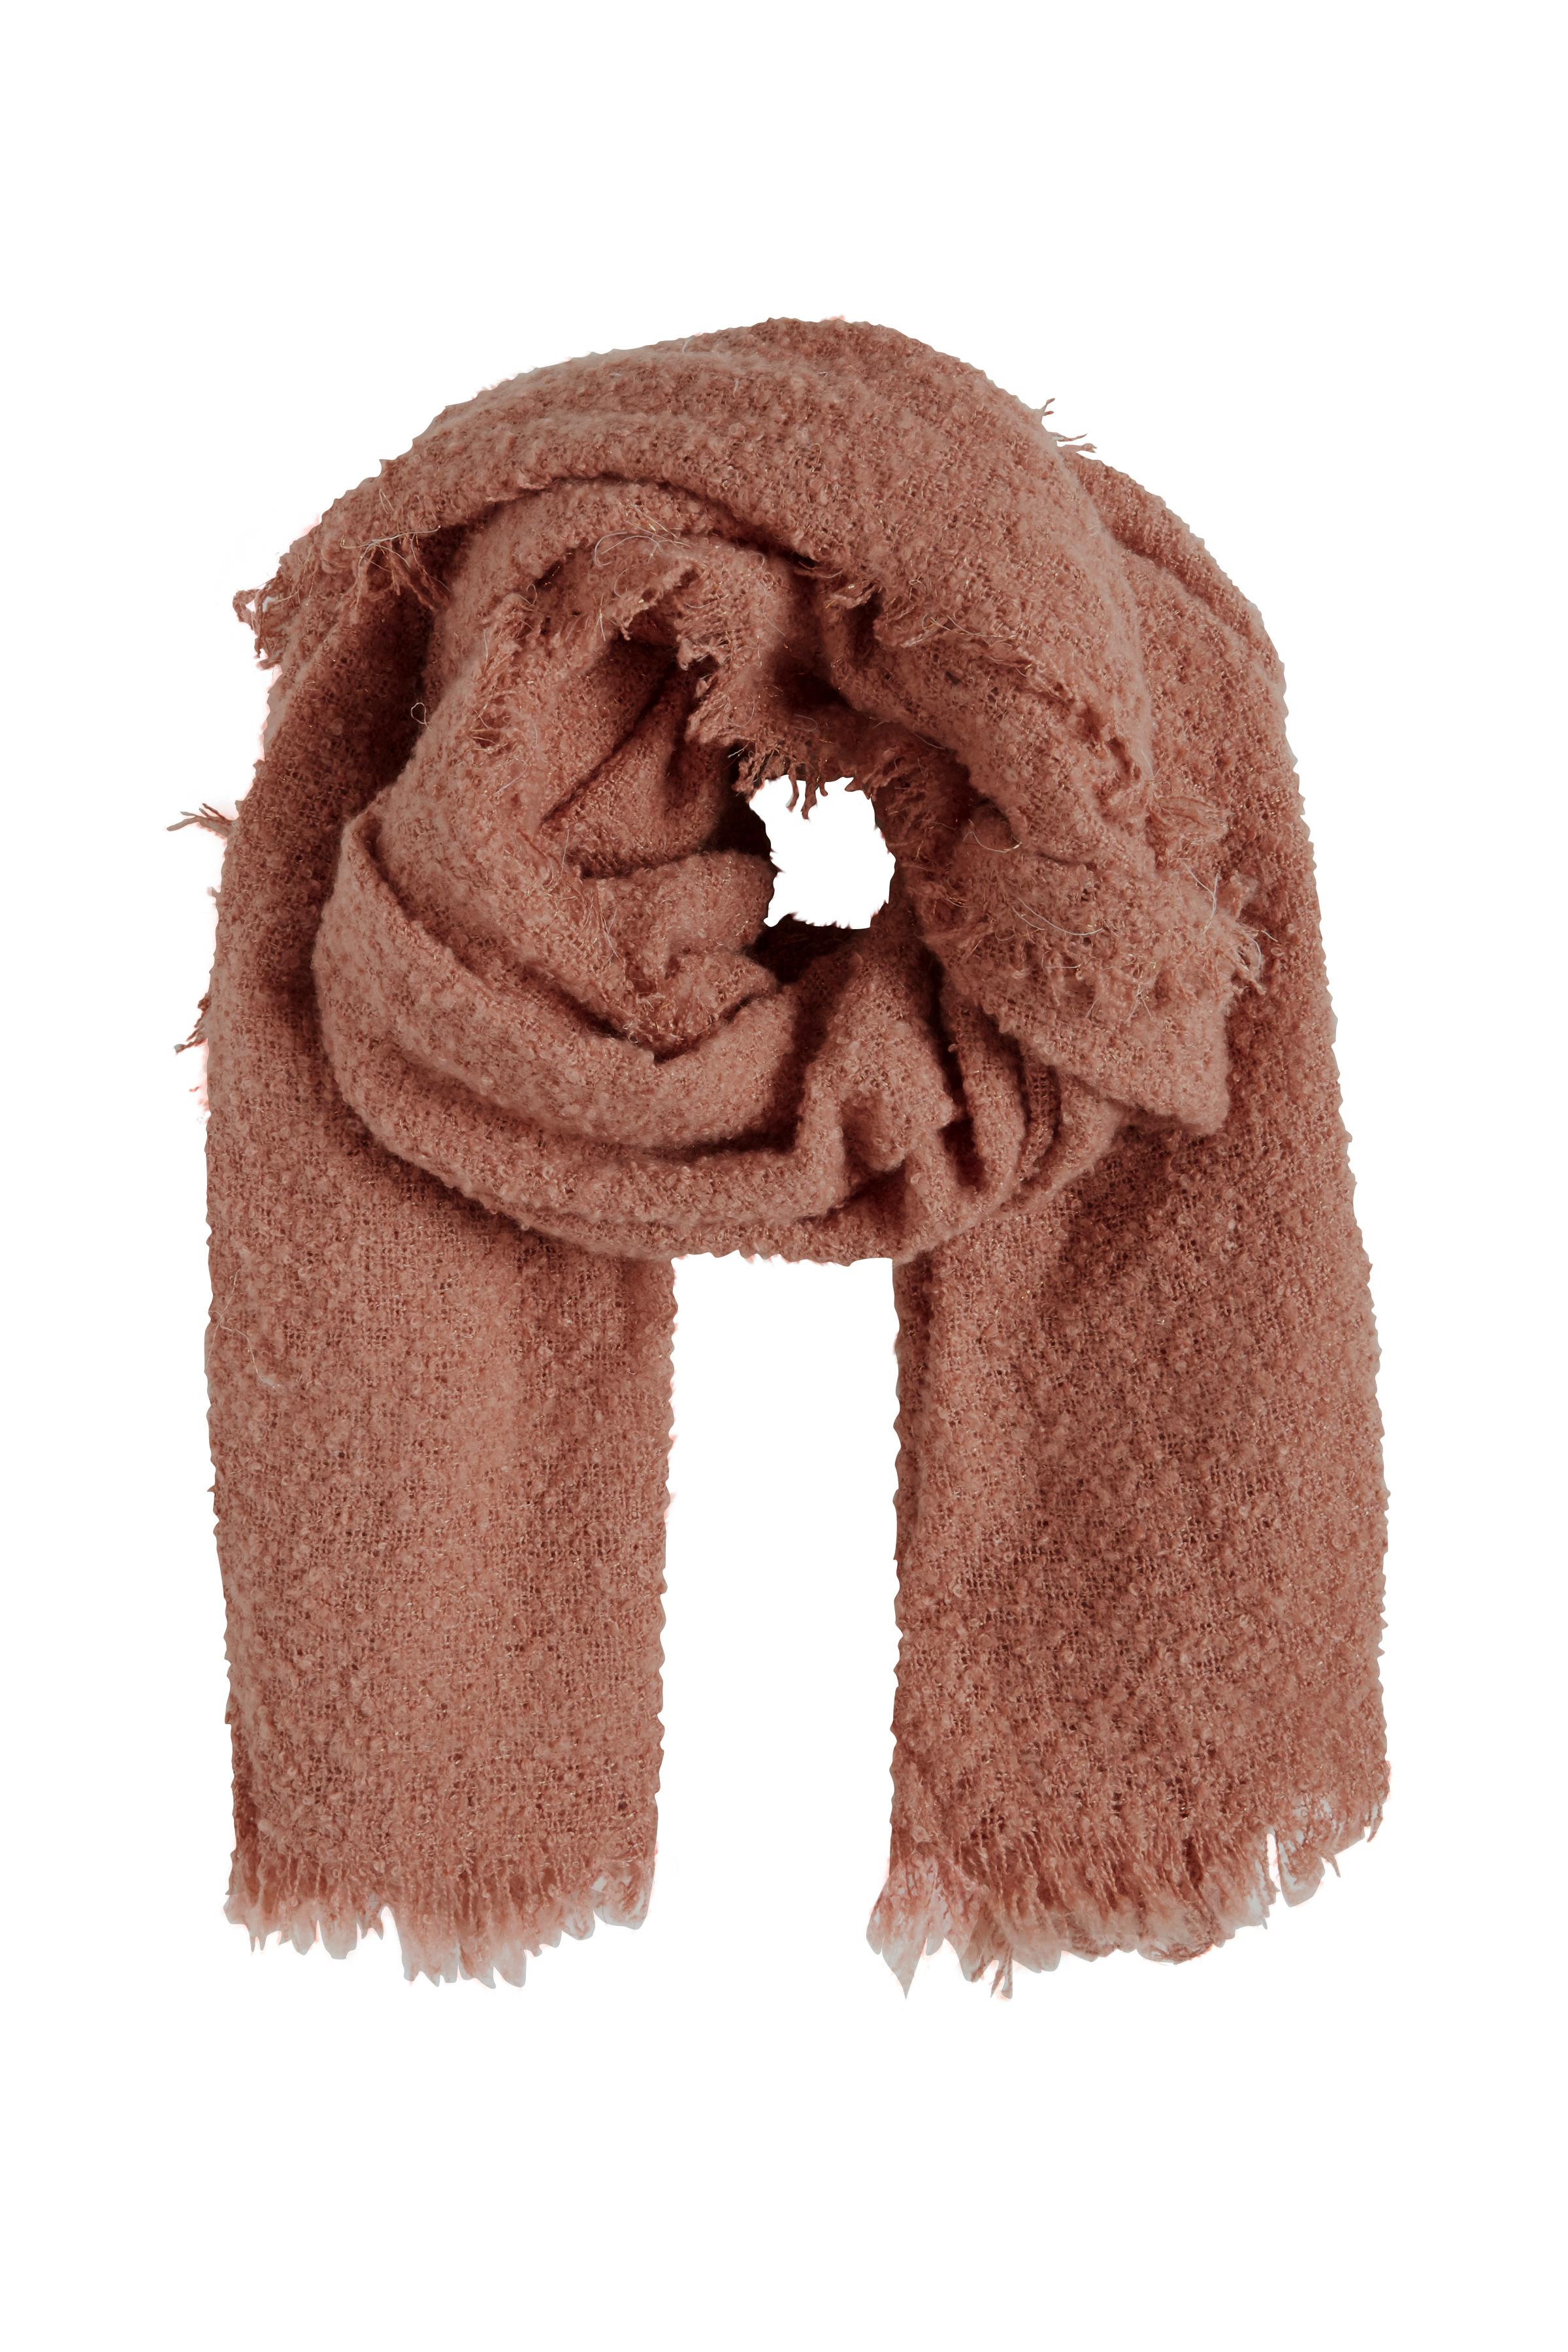 Støvet rosa Tørklæde fra Ichi - accessories – Køb Støvet rosa Tørklæde fra str. ONE her